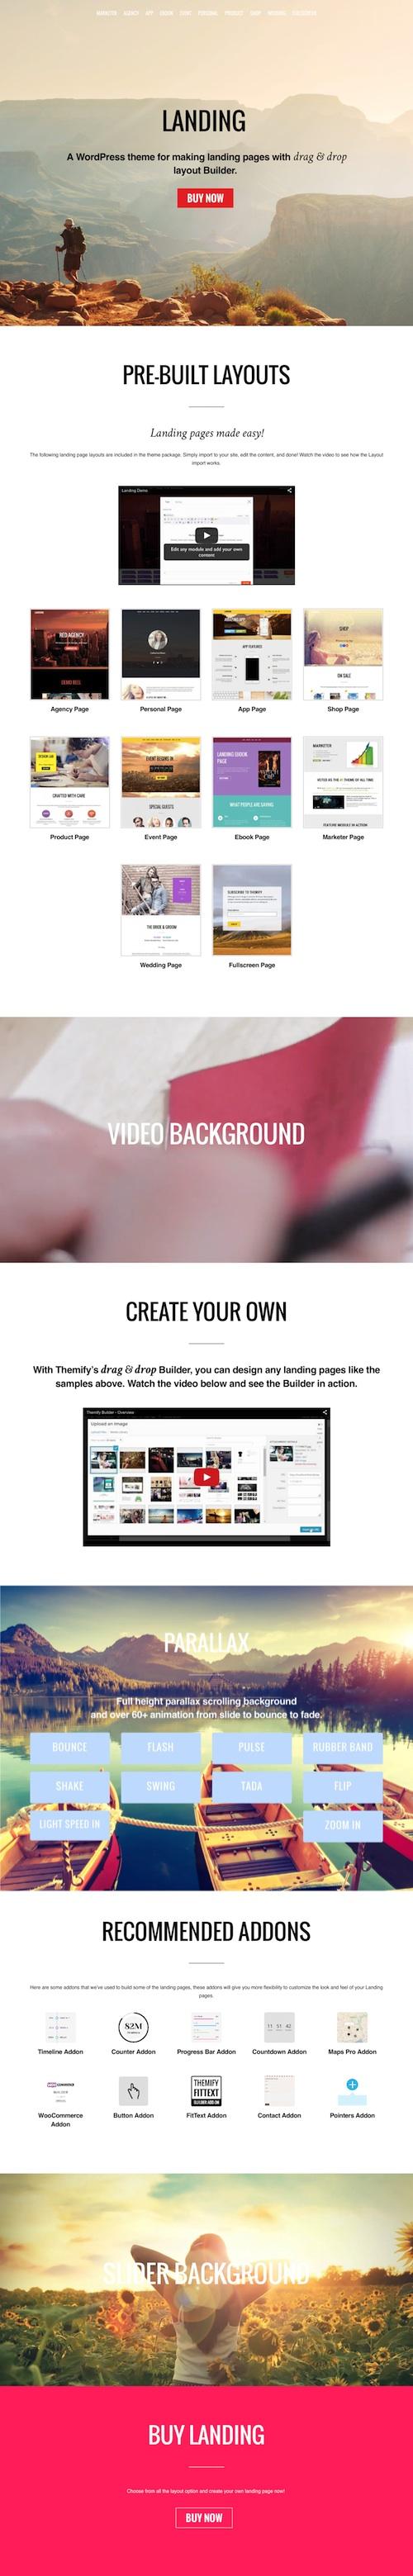 Landing Page WordPress Theme with Drag & Drop Layout Builder